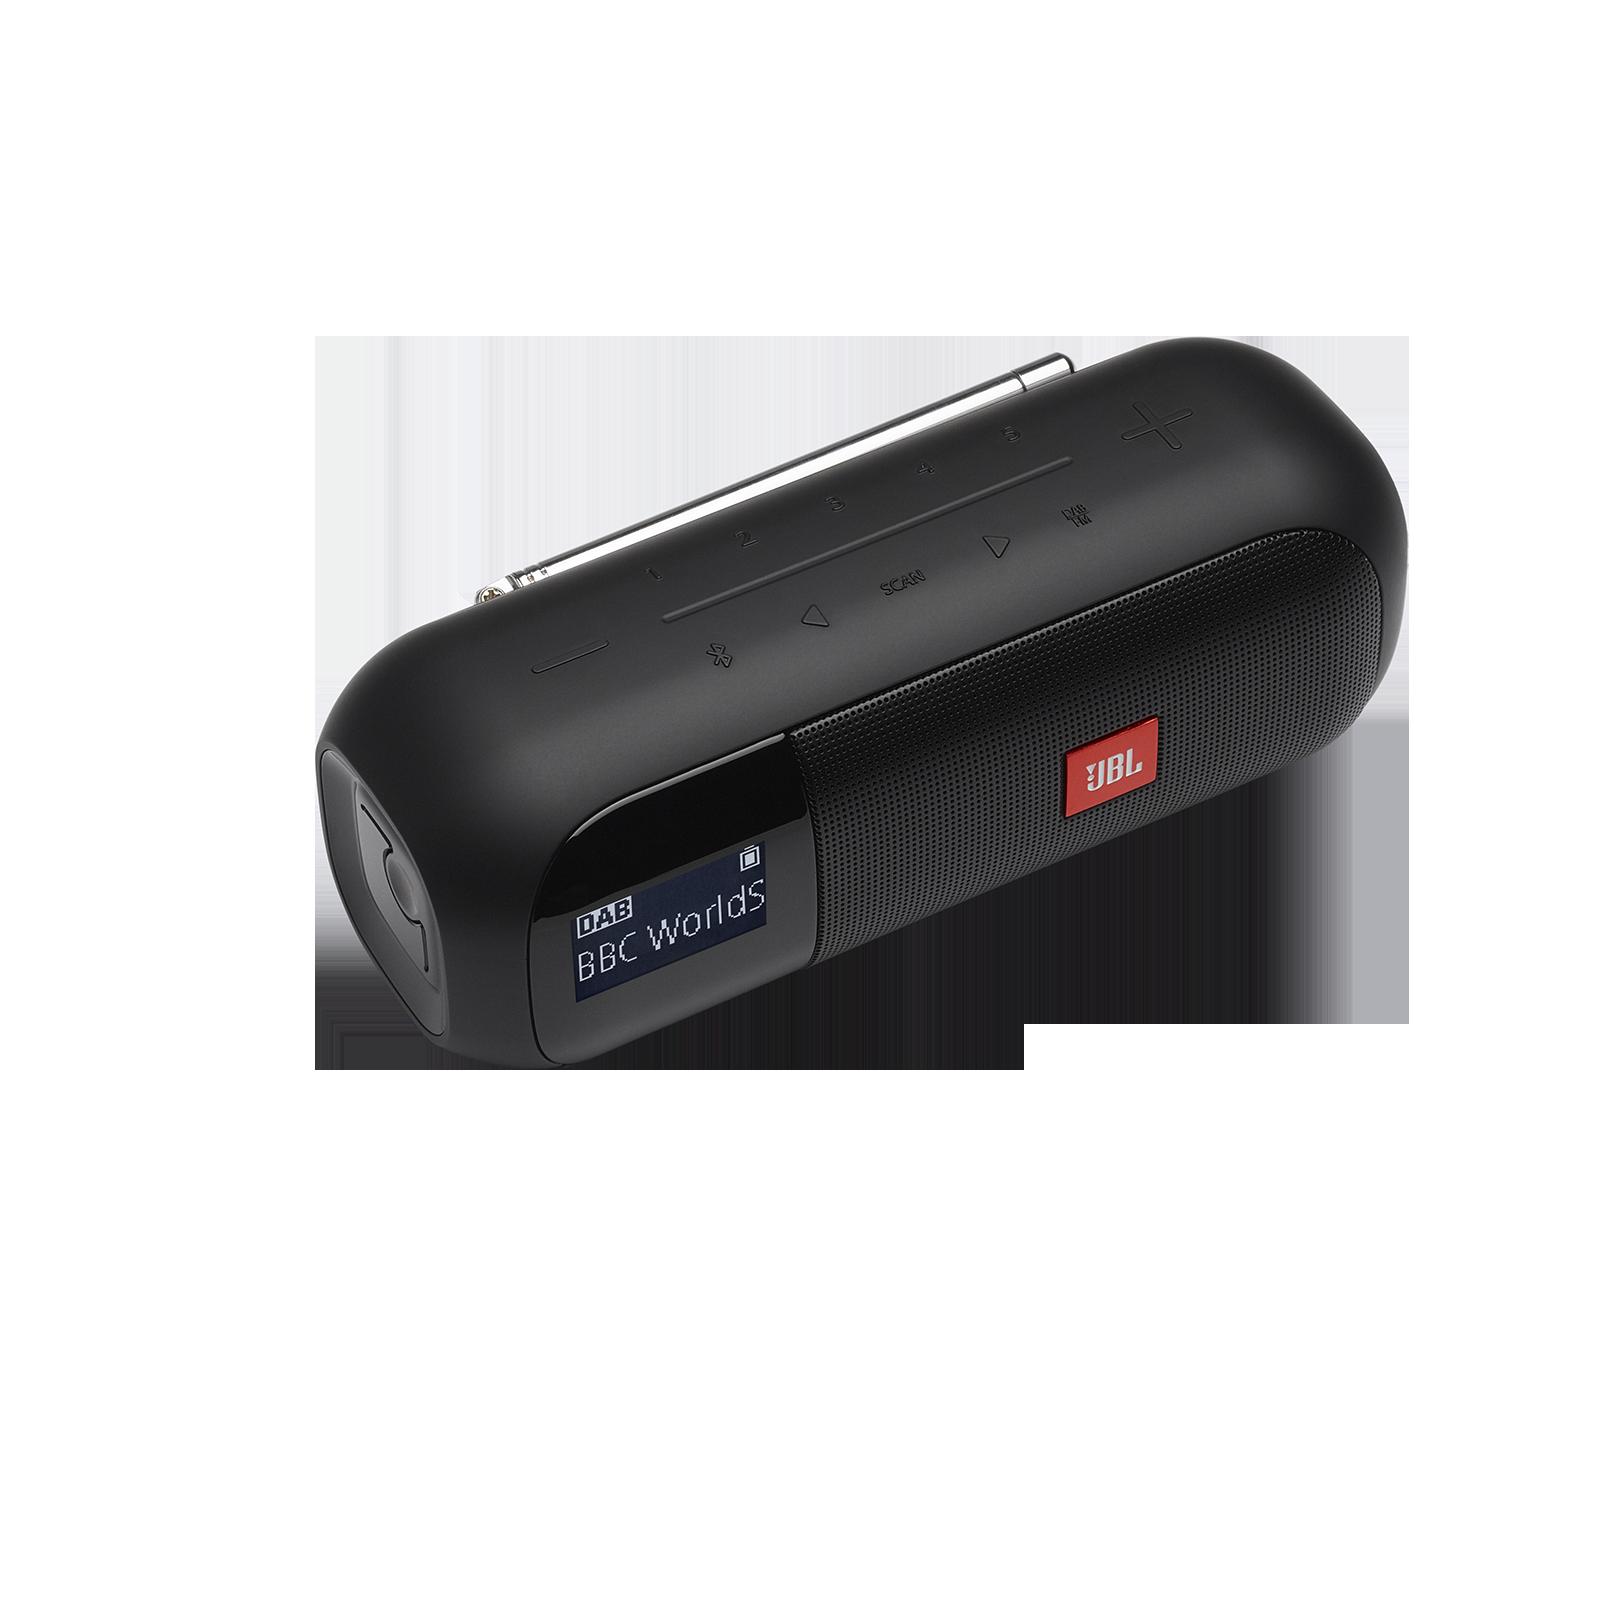 JBL Tuner 2 - Black - Portable DAB/DAB+/FM radio with Bluetooth - Detailshot 2